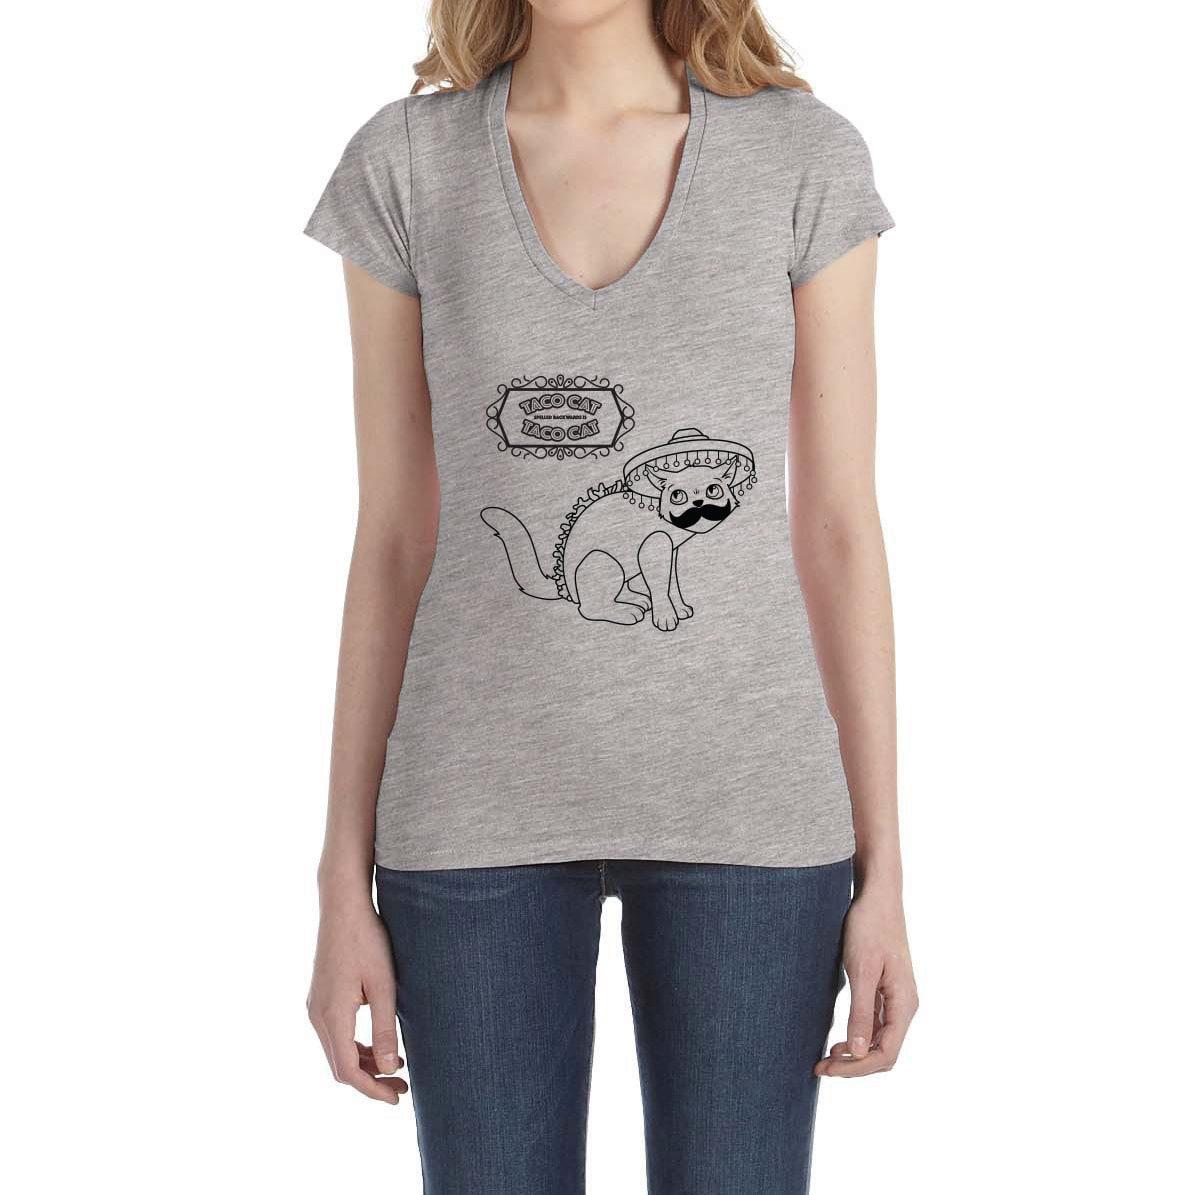 Taco Katze T Shirt lustige Katze-Shirt lustige Katze T   Etsy